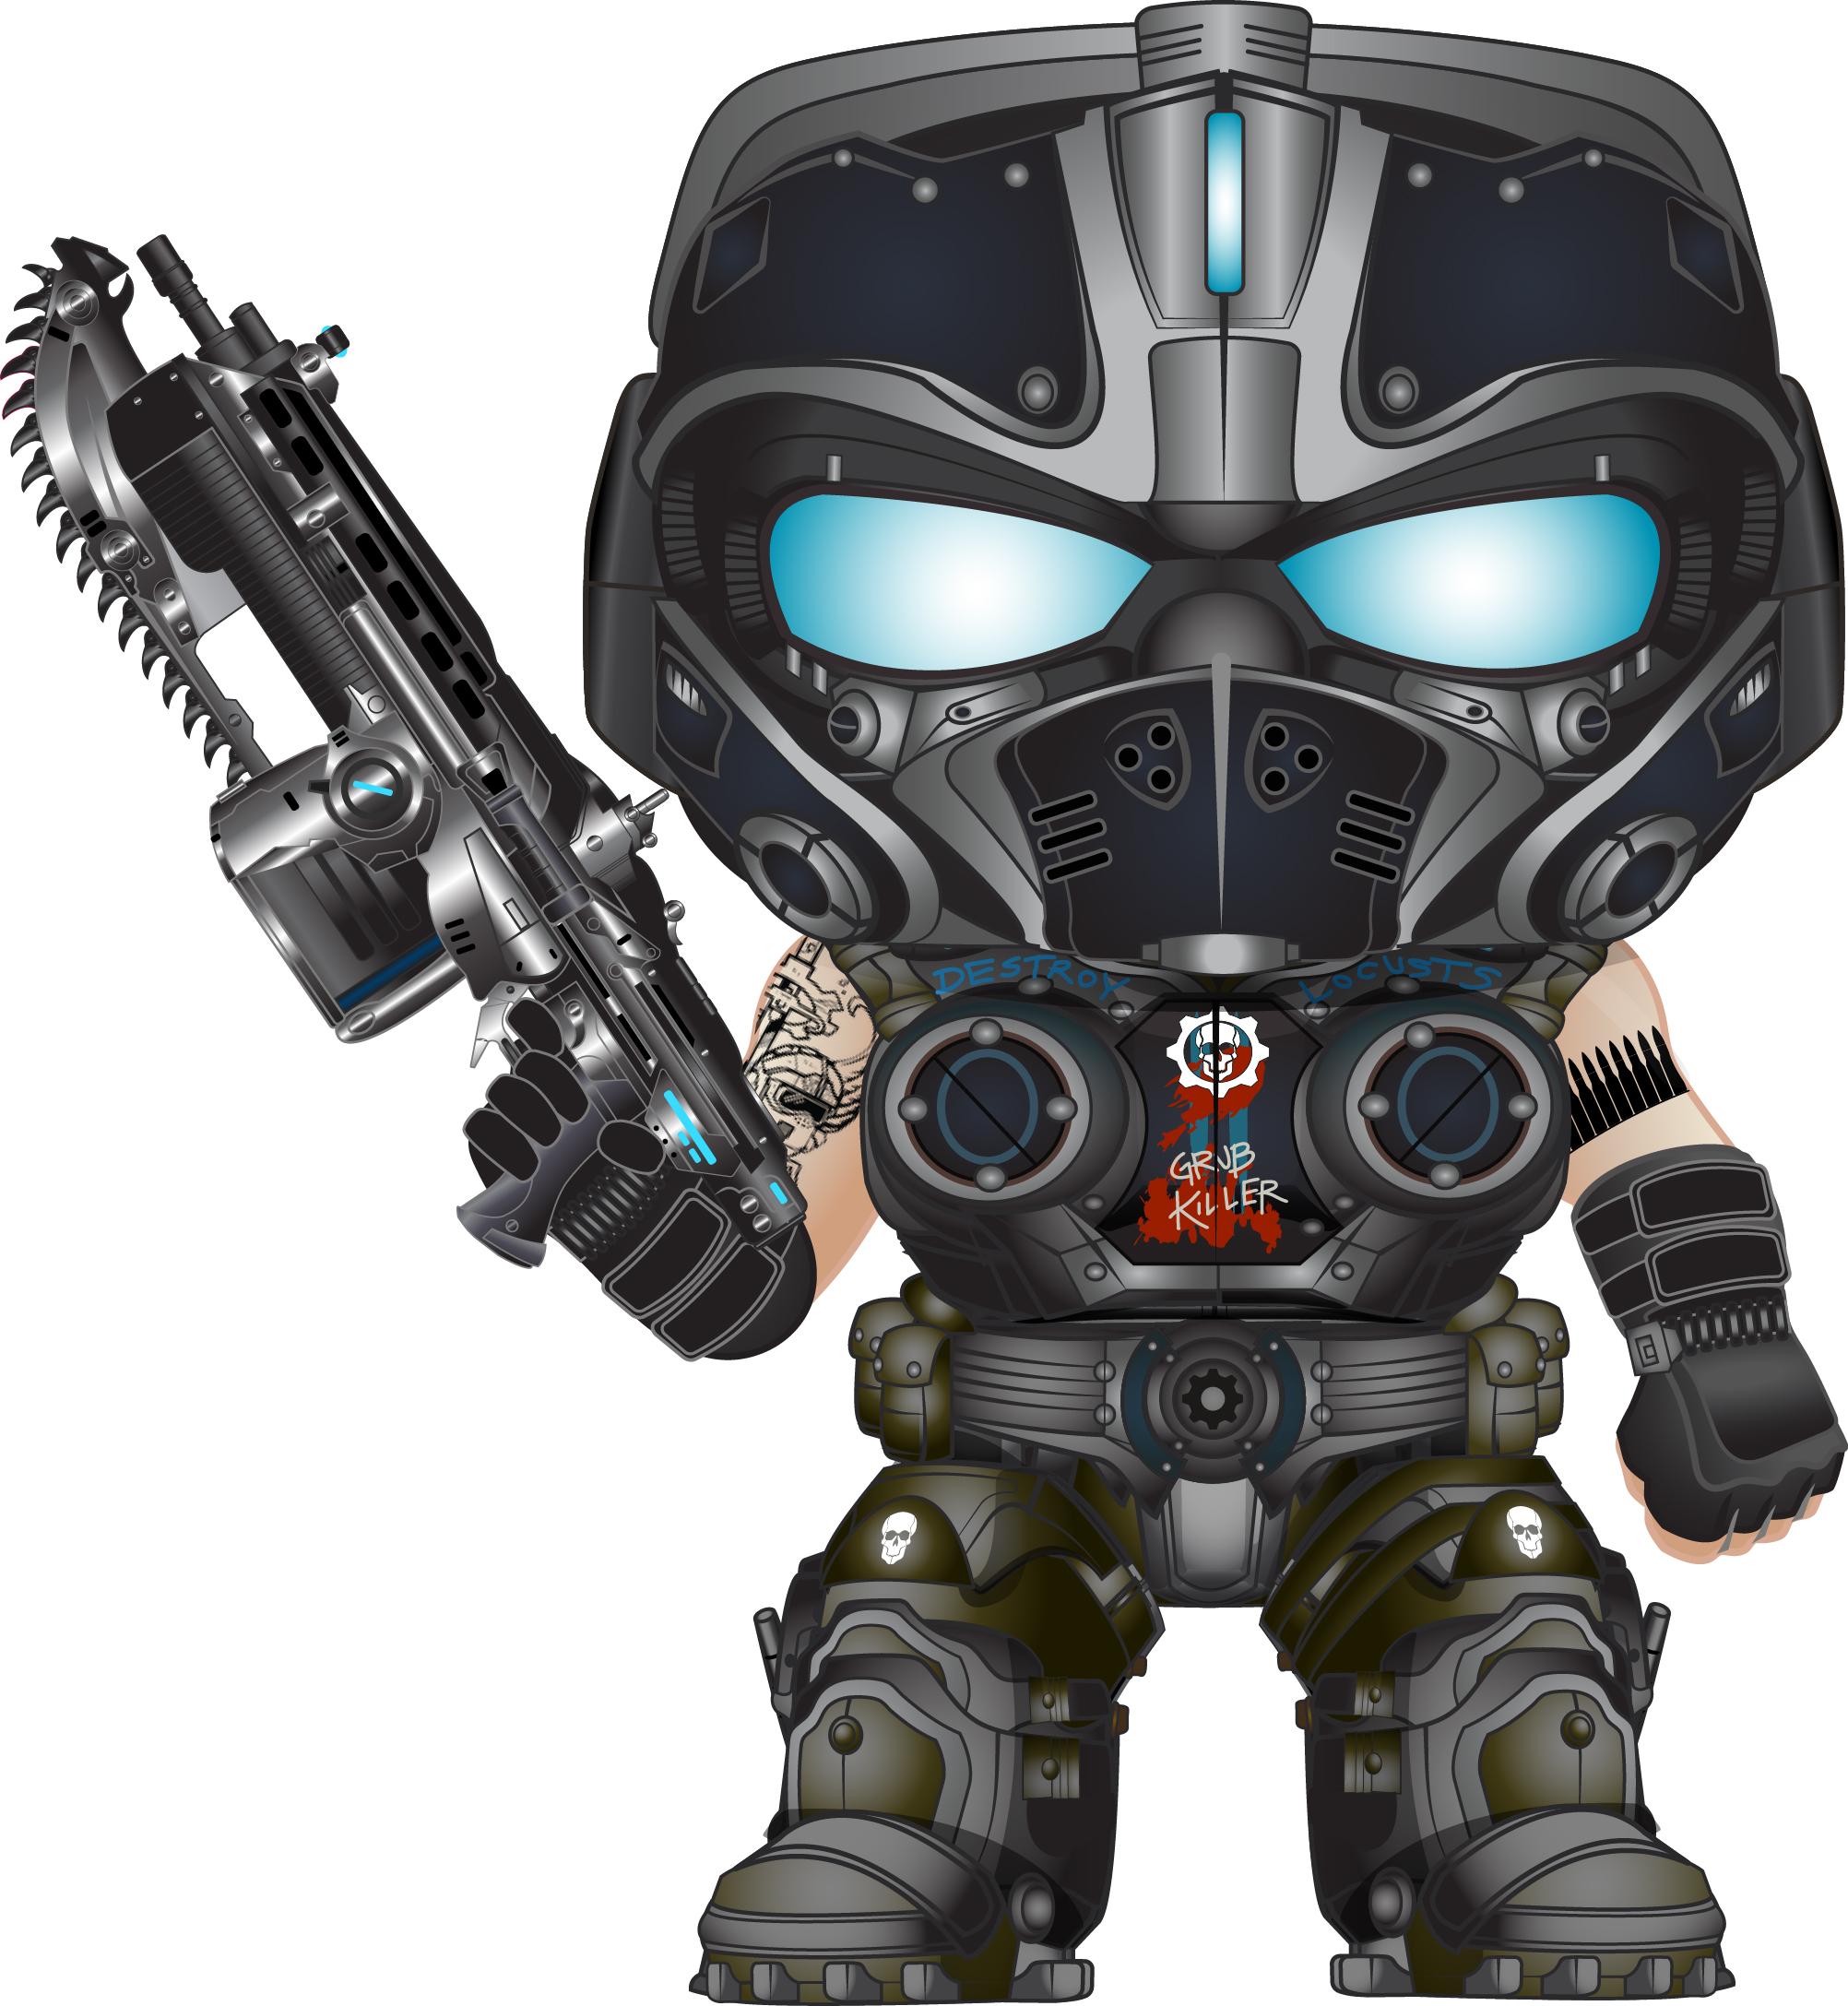 Del; HyperX CloudX Revolver Gears of War Gaming Headset Left Side View;  Funko Pop! - Gears Of War HD PNG